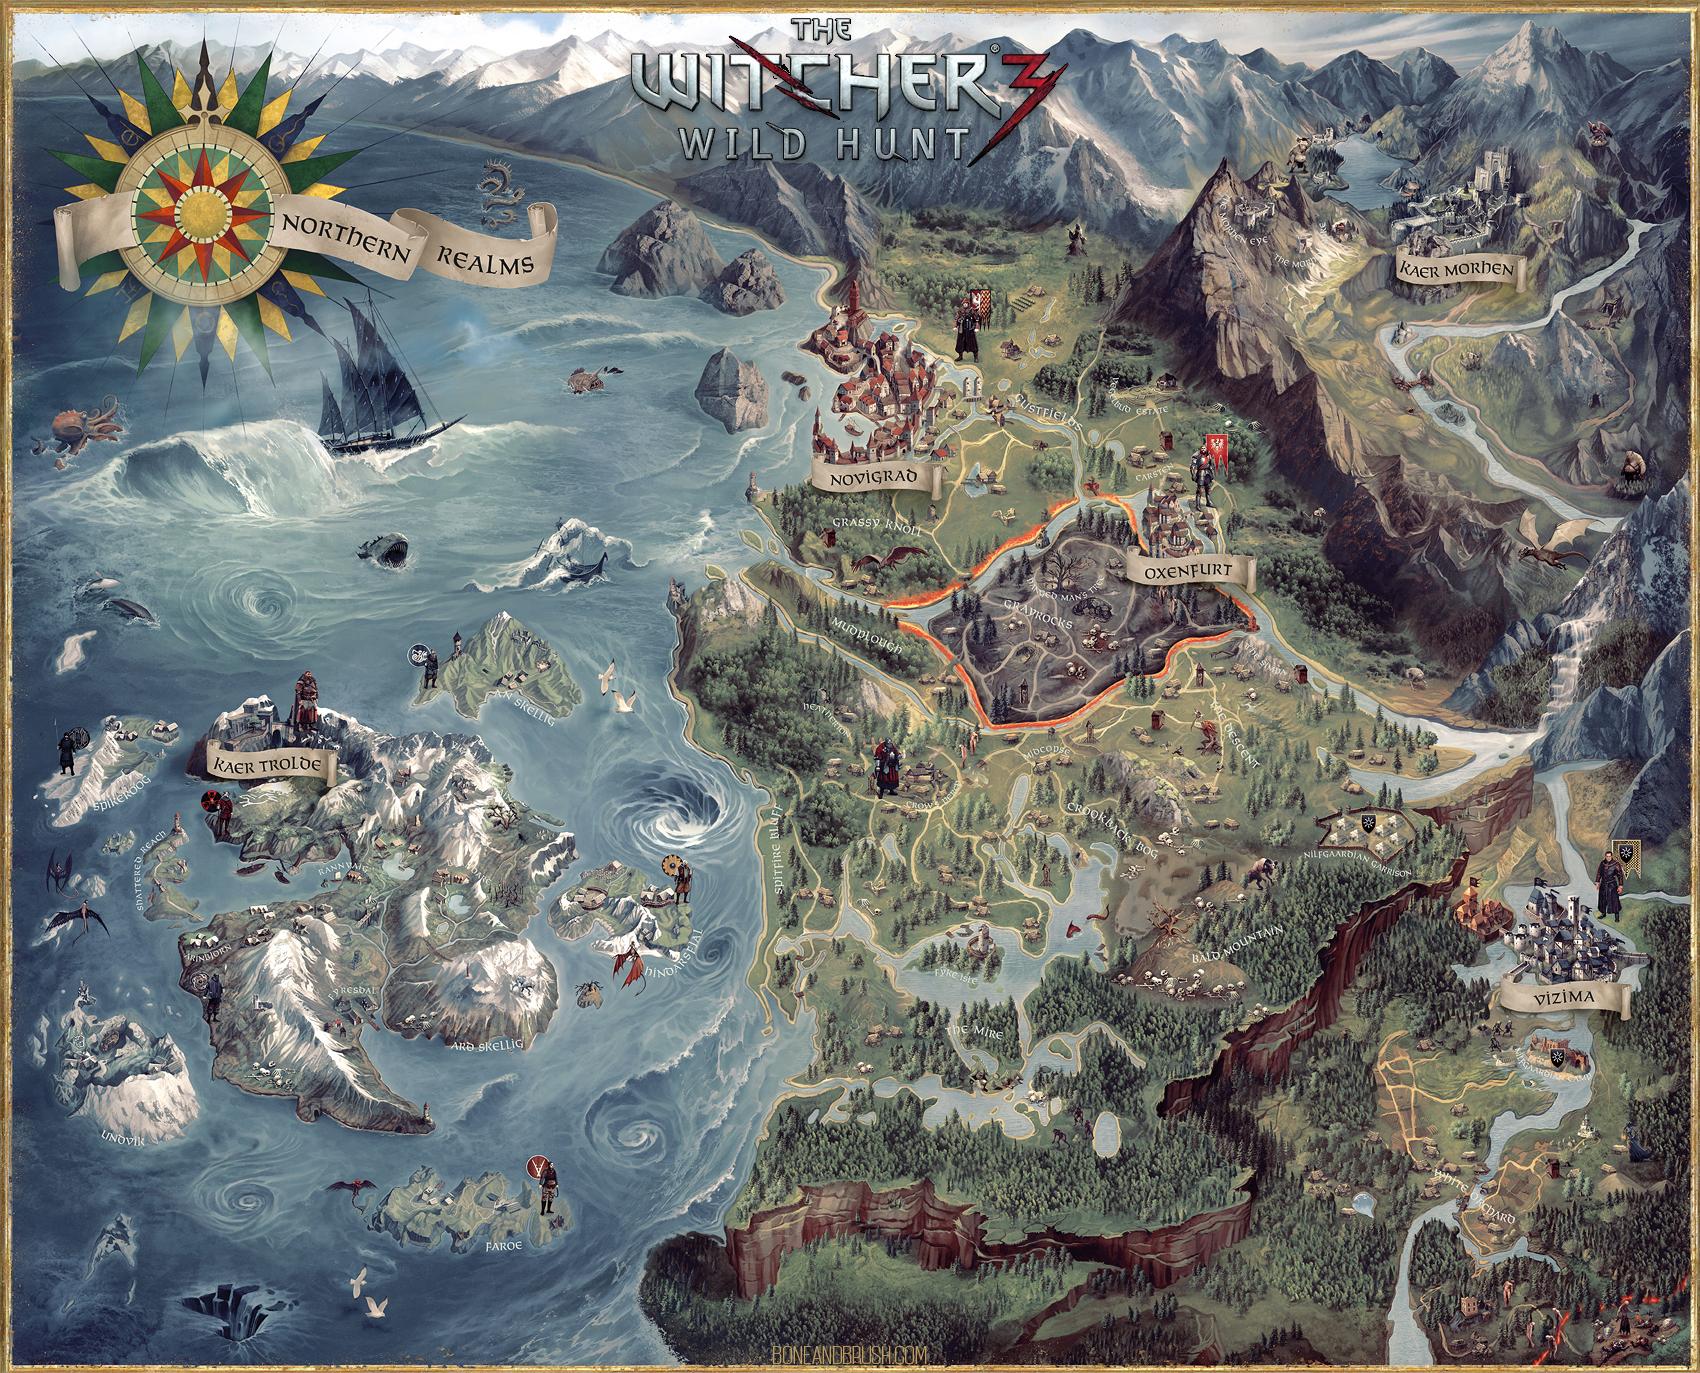 https://orig08.deviantart.net/2f2c/f/2015/163/1/8/witcher_3_collectors_edition_map__full__by_damie_m-d8typt5.jpg